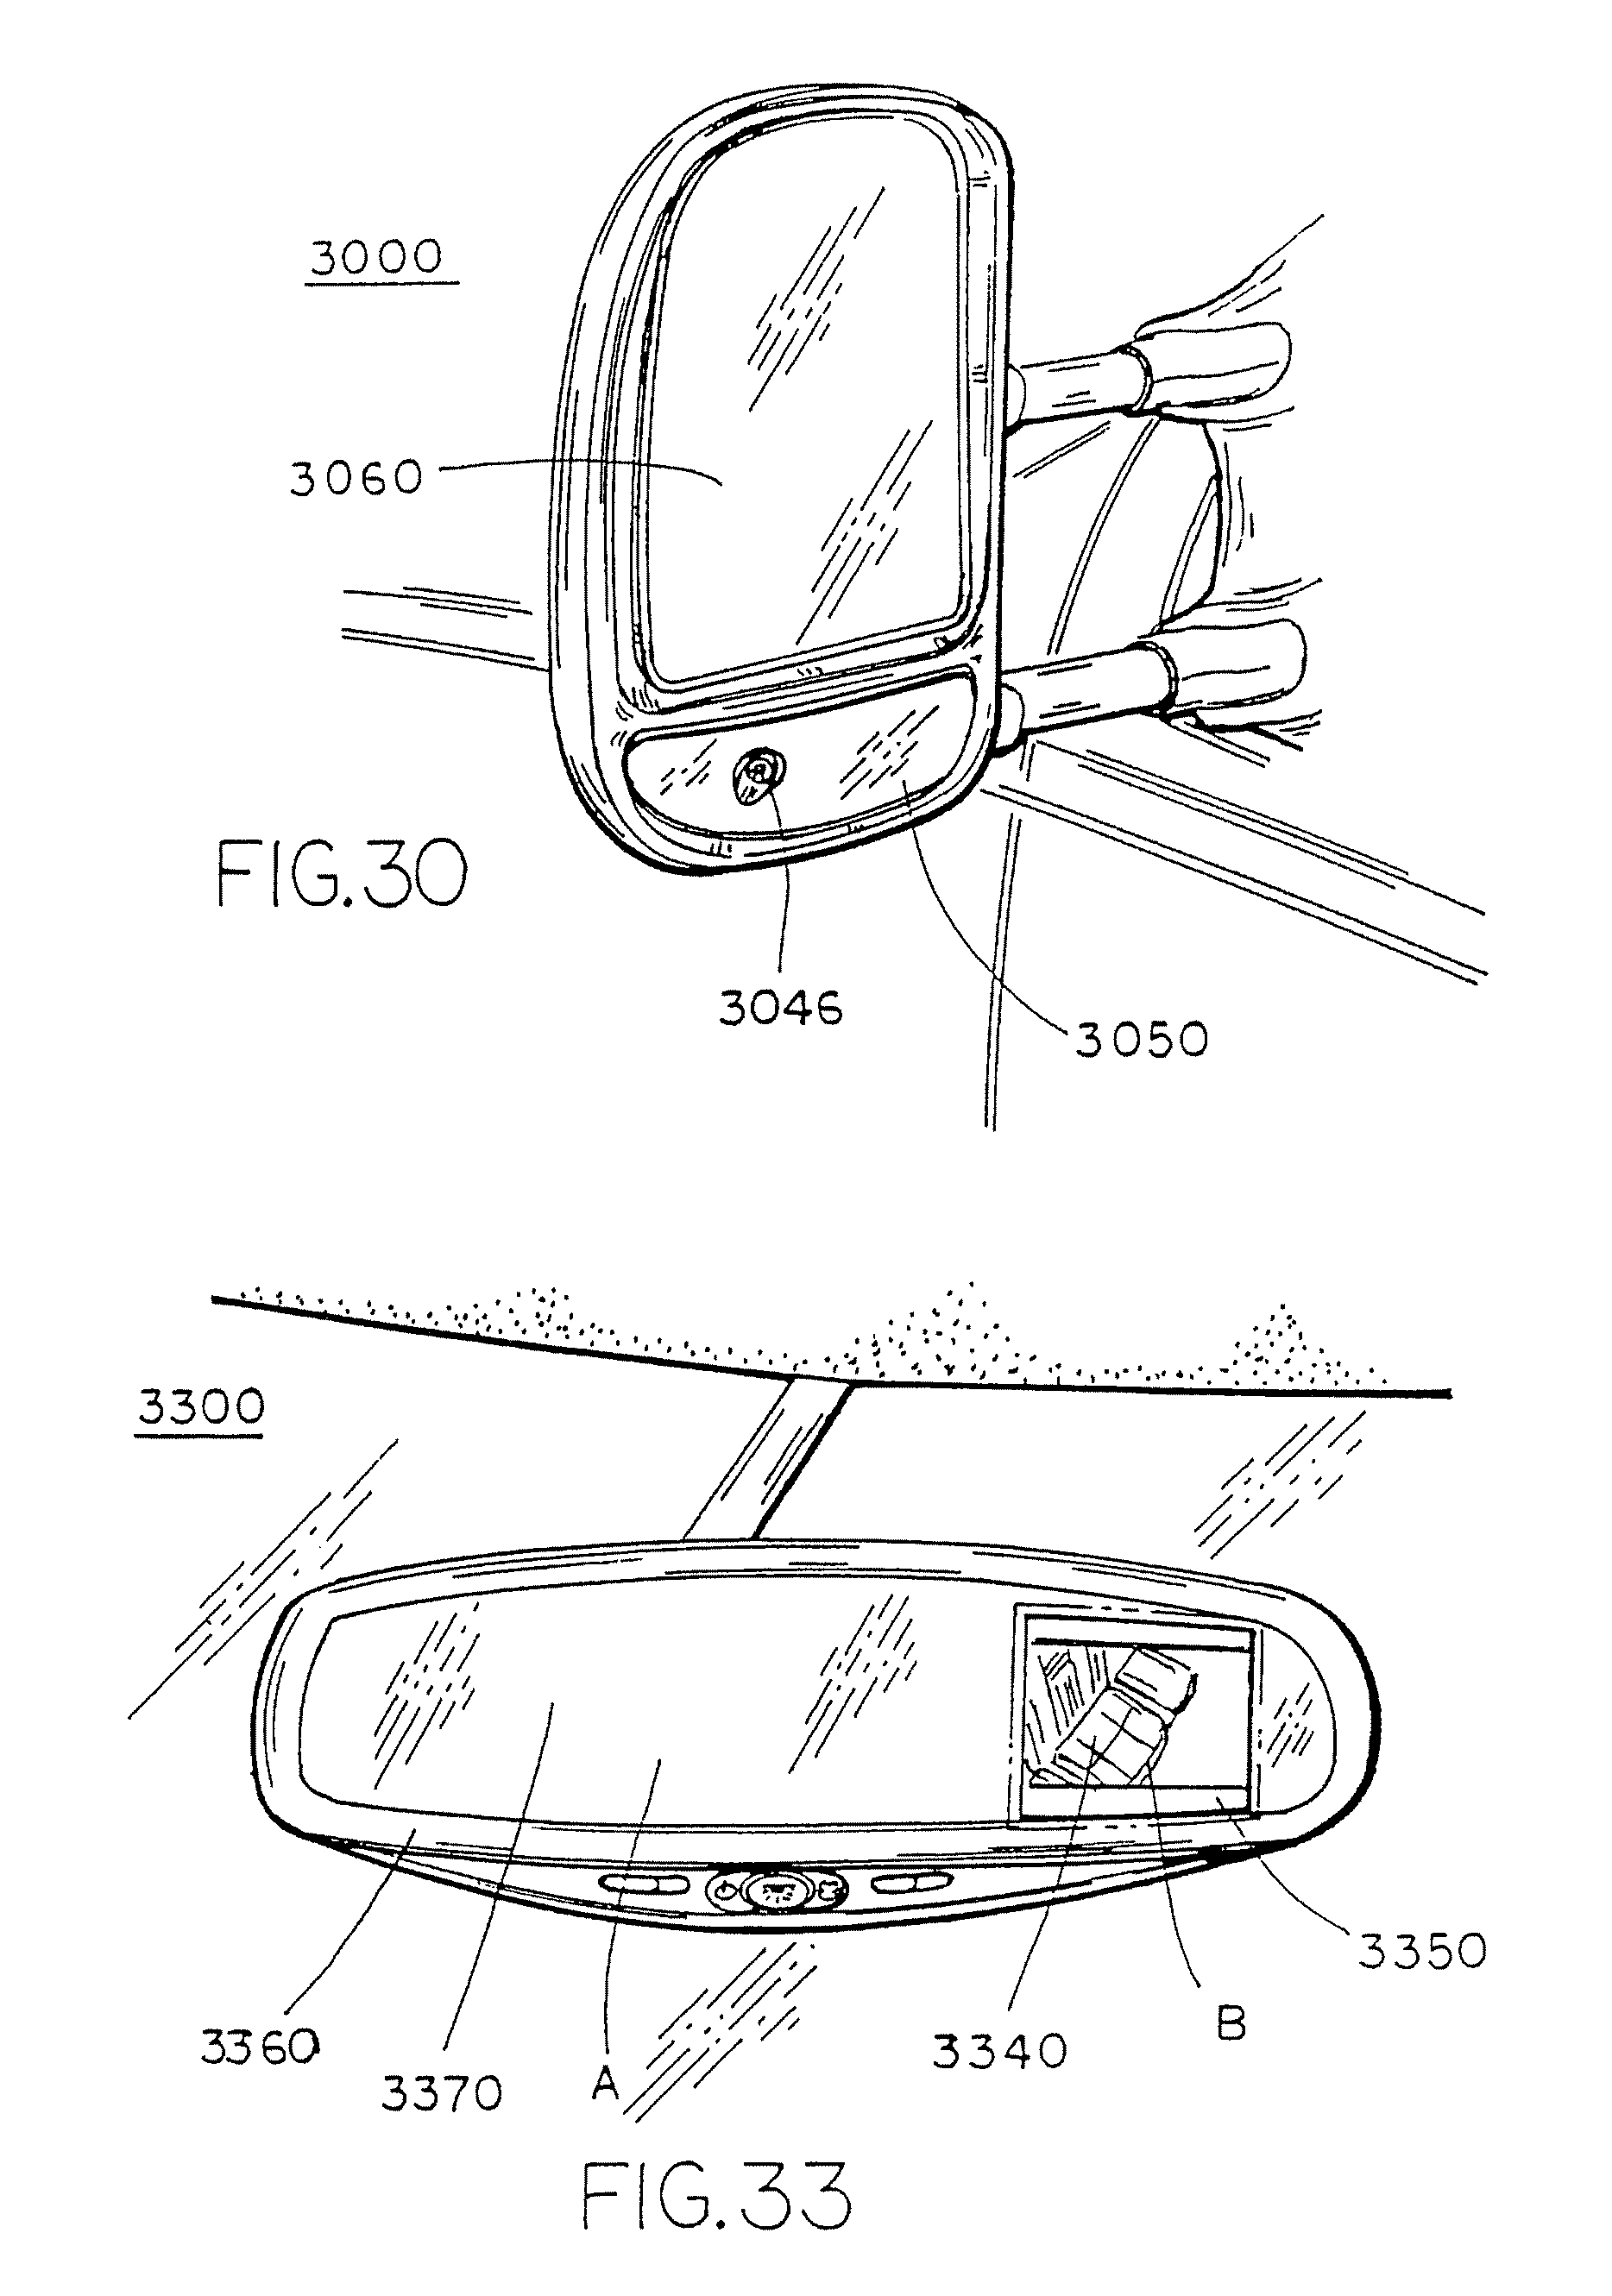 Patent US 8,044,776 B2